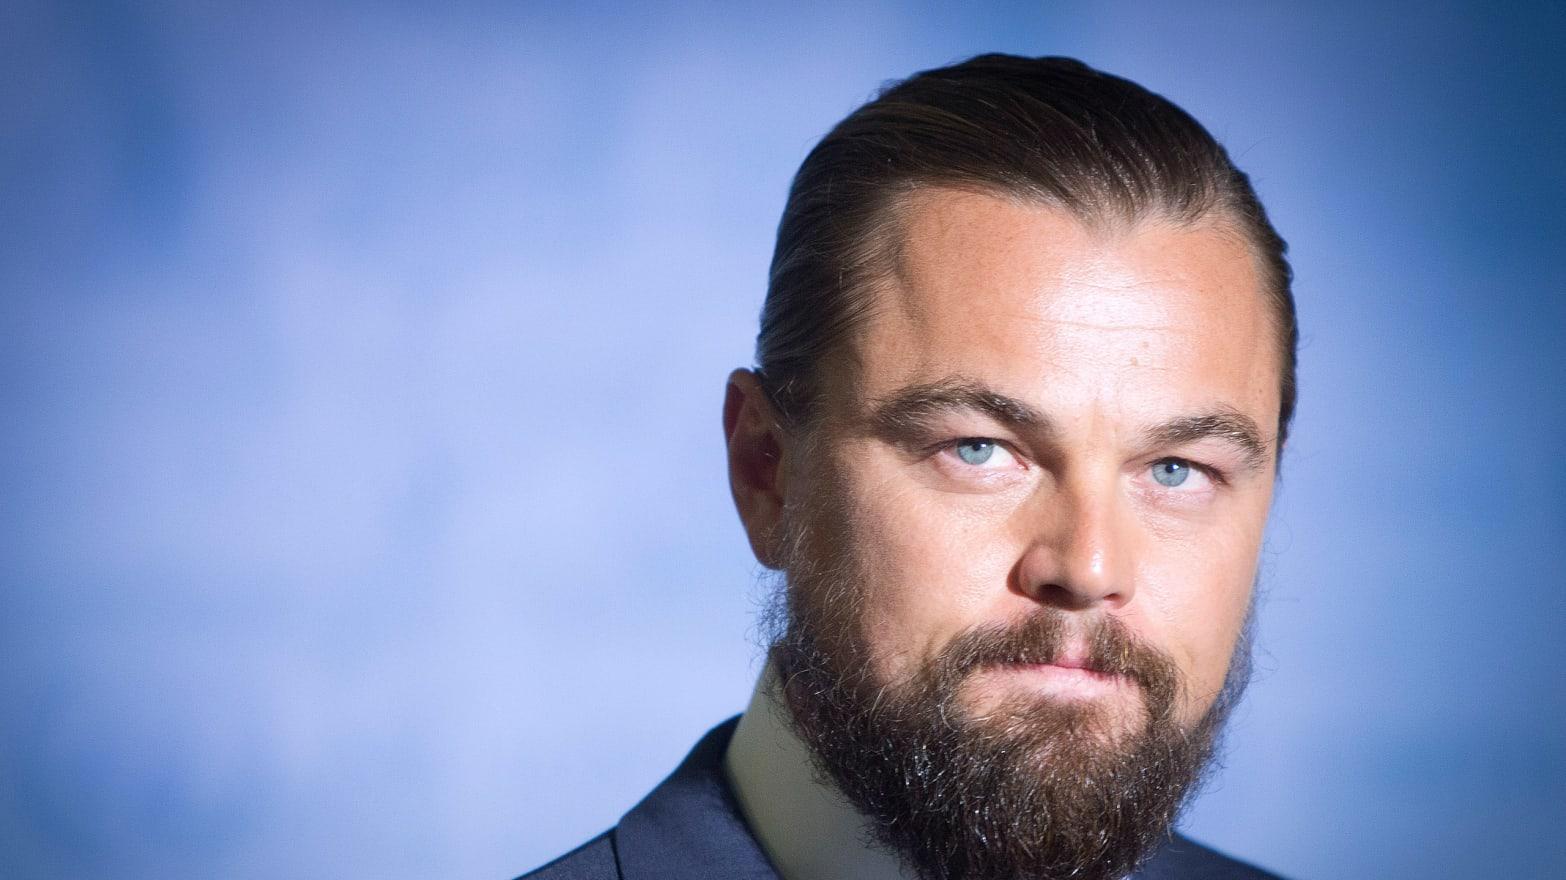 Leo The Beard Has To Go When A Man S Facial Hair Reaches